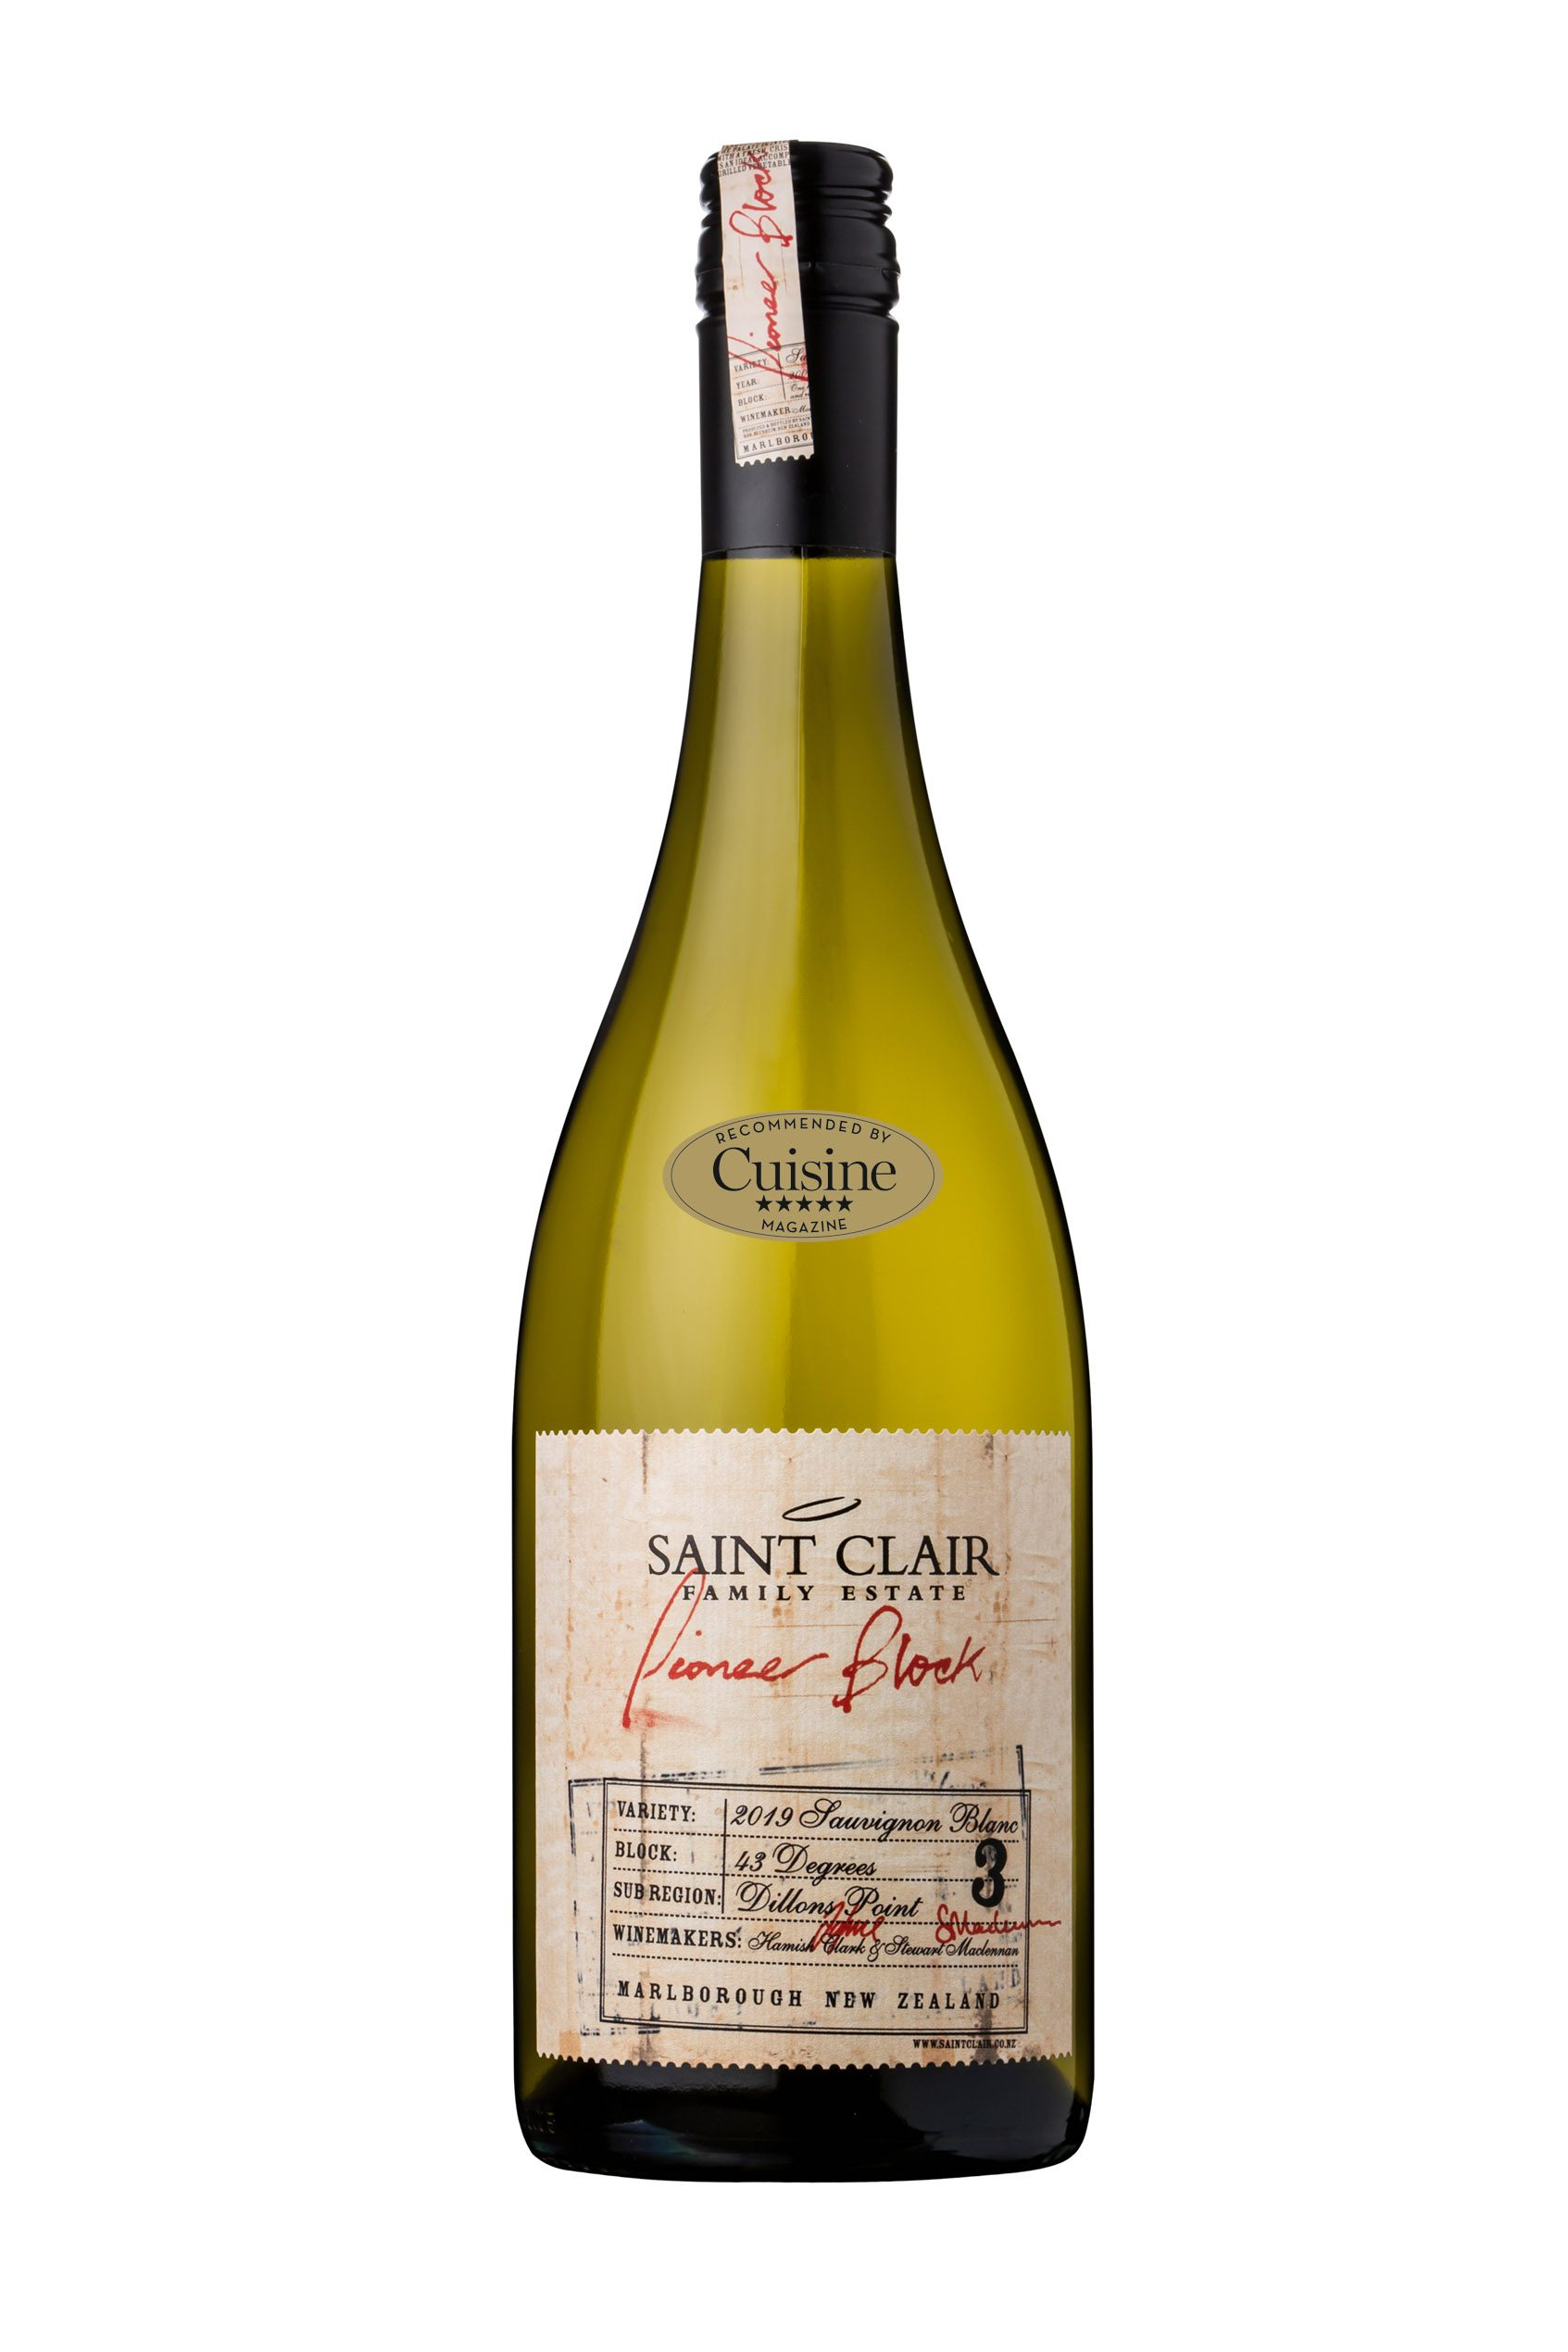 Saint Clair Pioneer Block 3 43 Degrees Sauvignon Blanc 2019 (Marlborough)